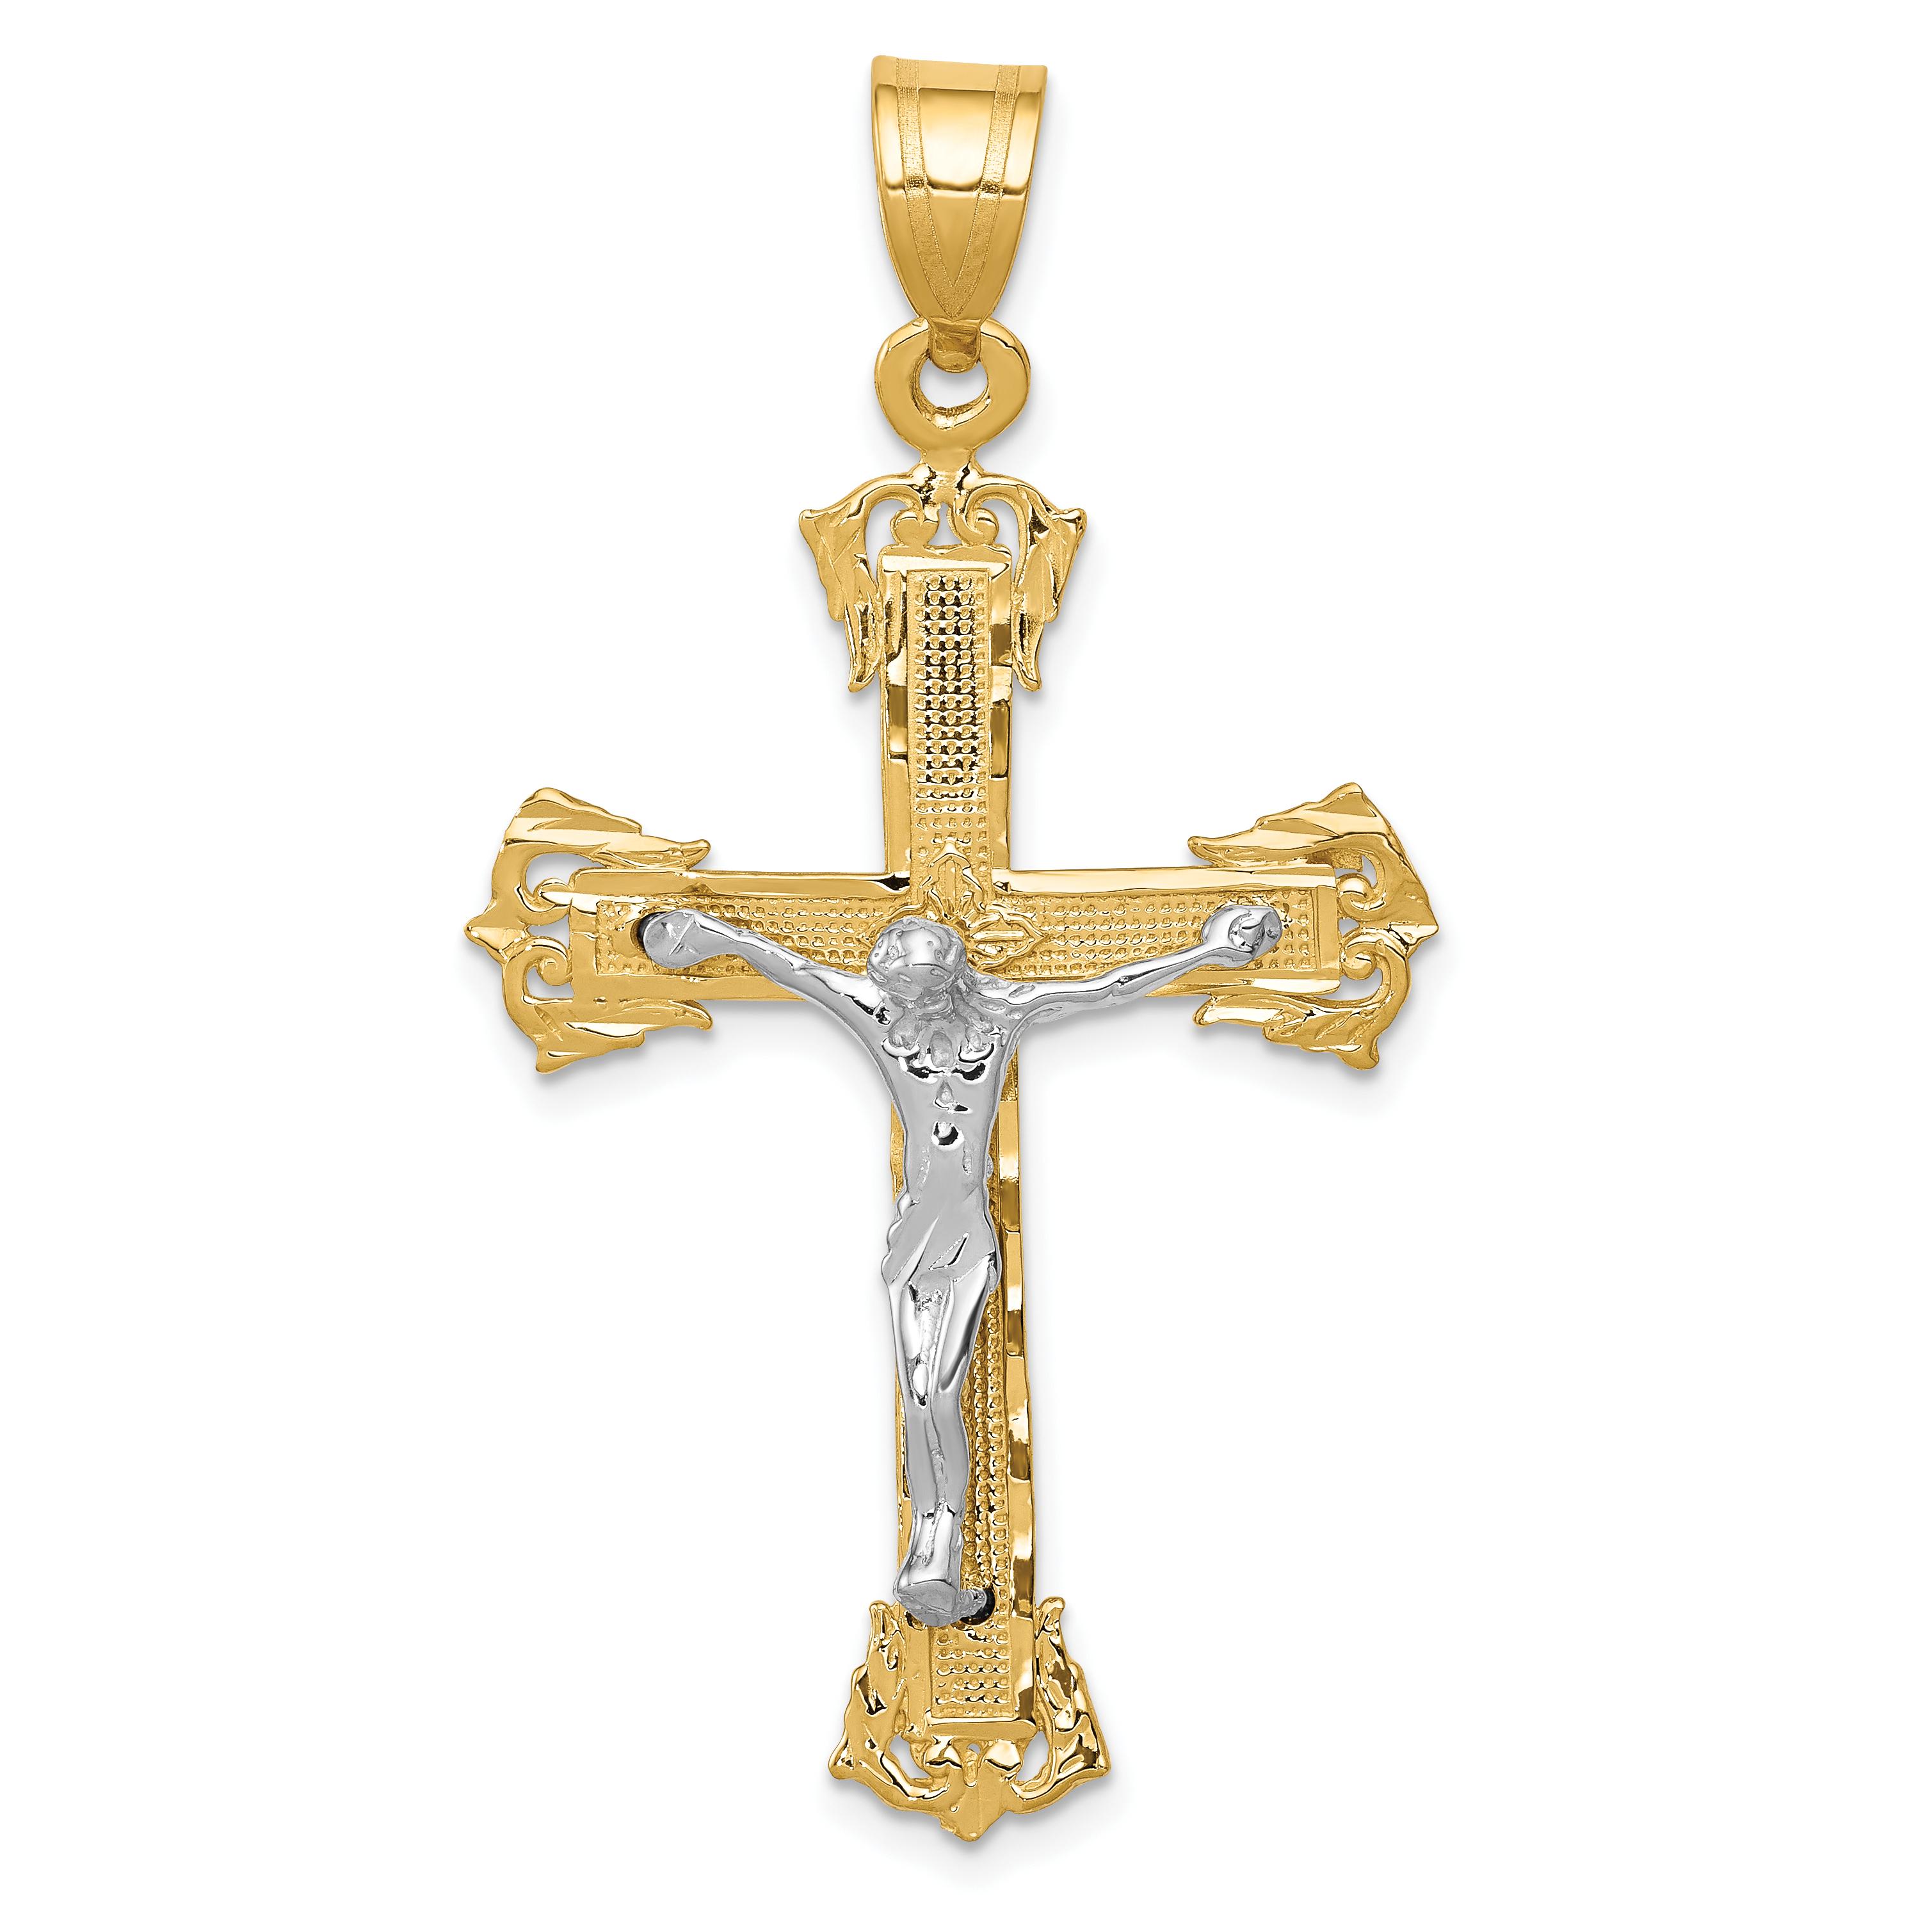 14k Two-tone Diamond-cut Crucifix Pendant. Weight: 3.01, Length: 50, Width: 28